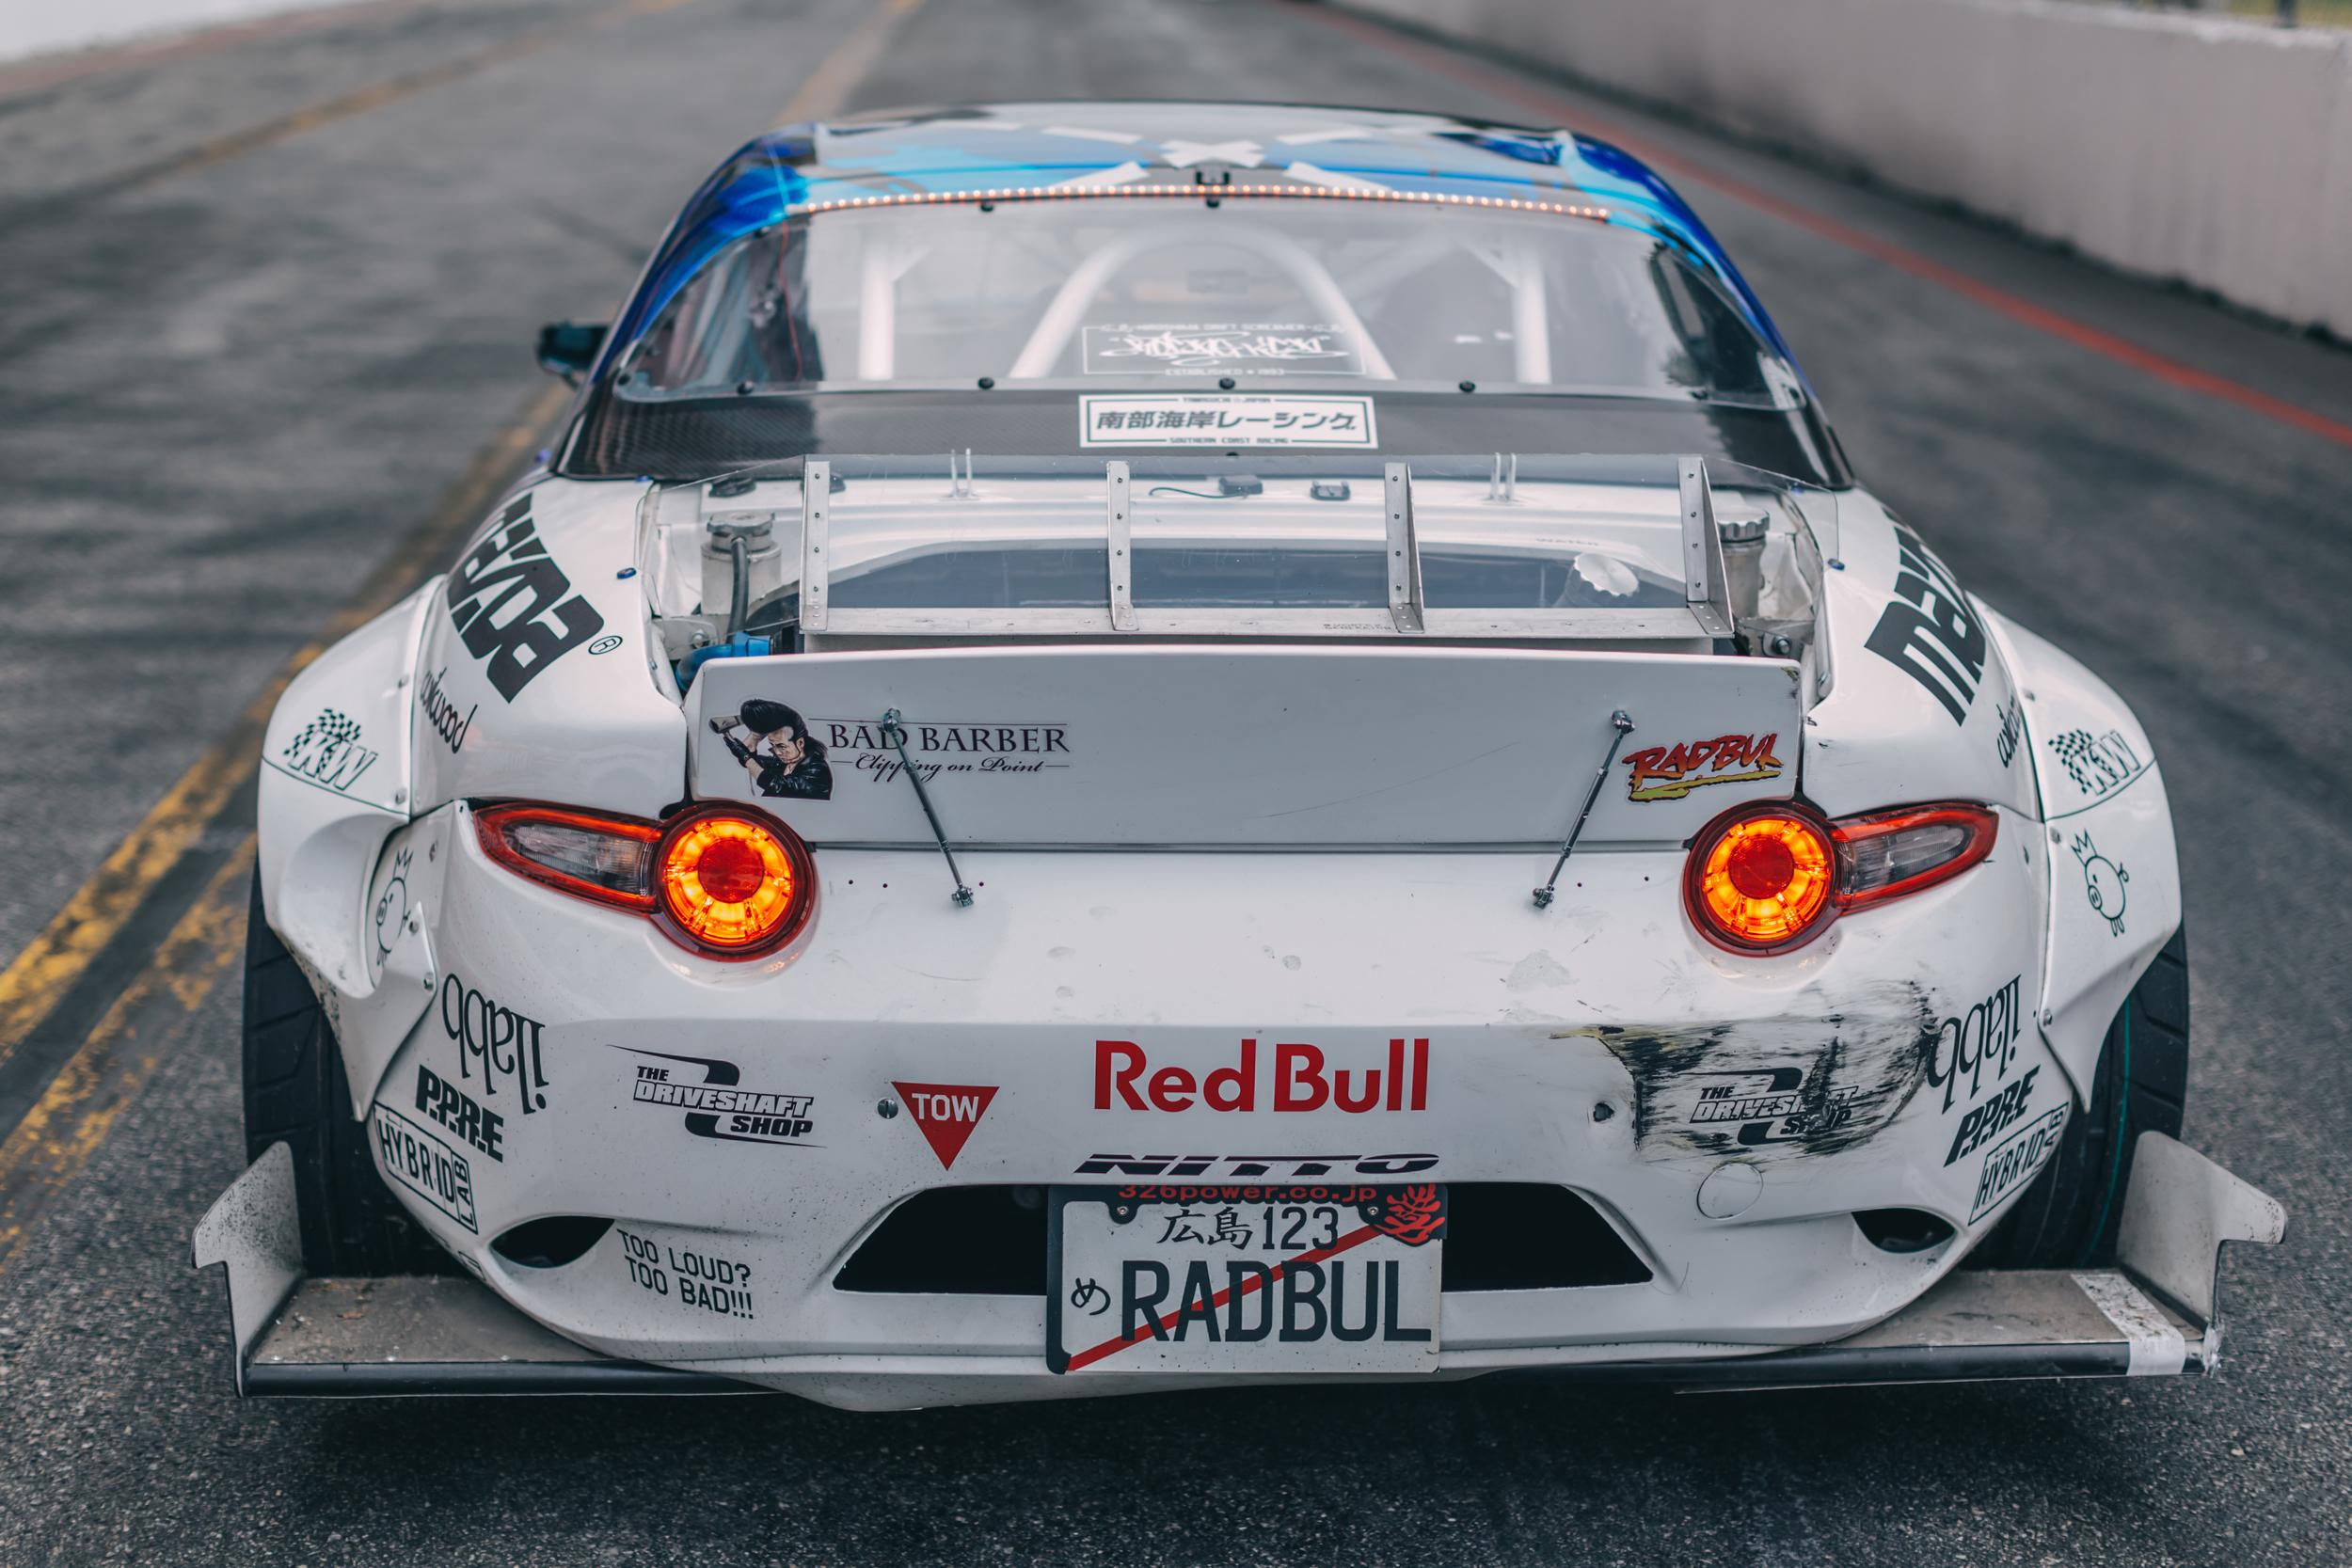 4.8.2016 - 4.9.2016 - Formula Drift - Mad Mike Whiddett Rad Bull Mazda MX-5 - Edited (26 of 102).jpg